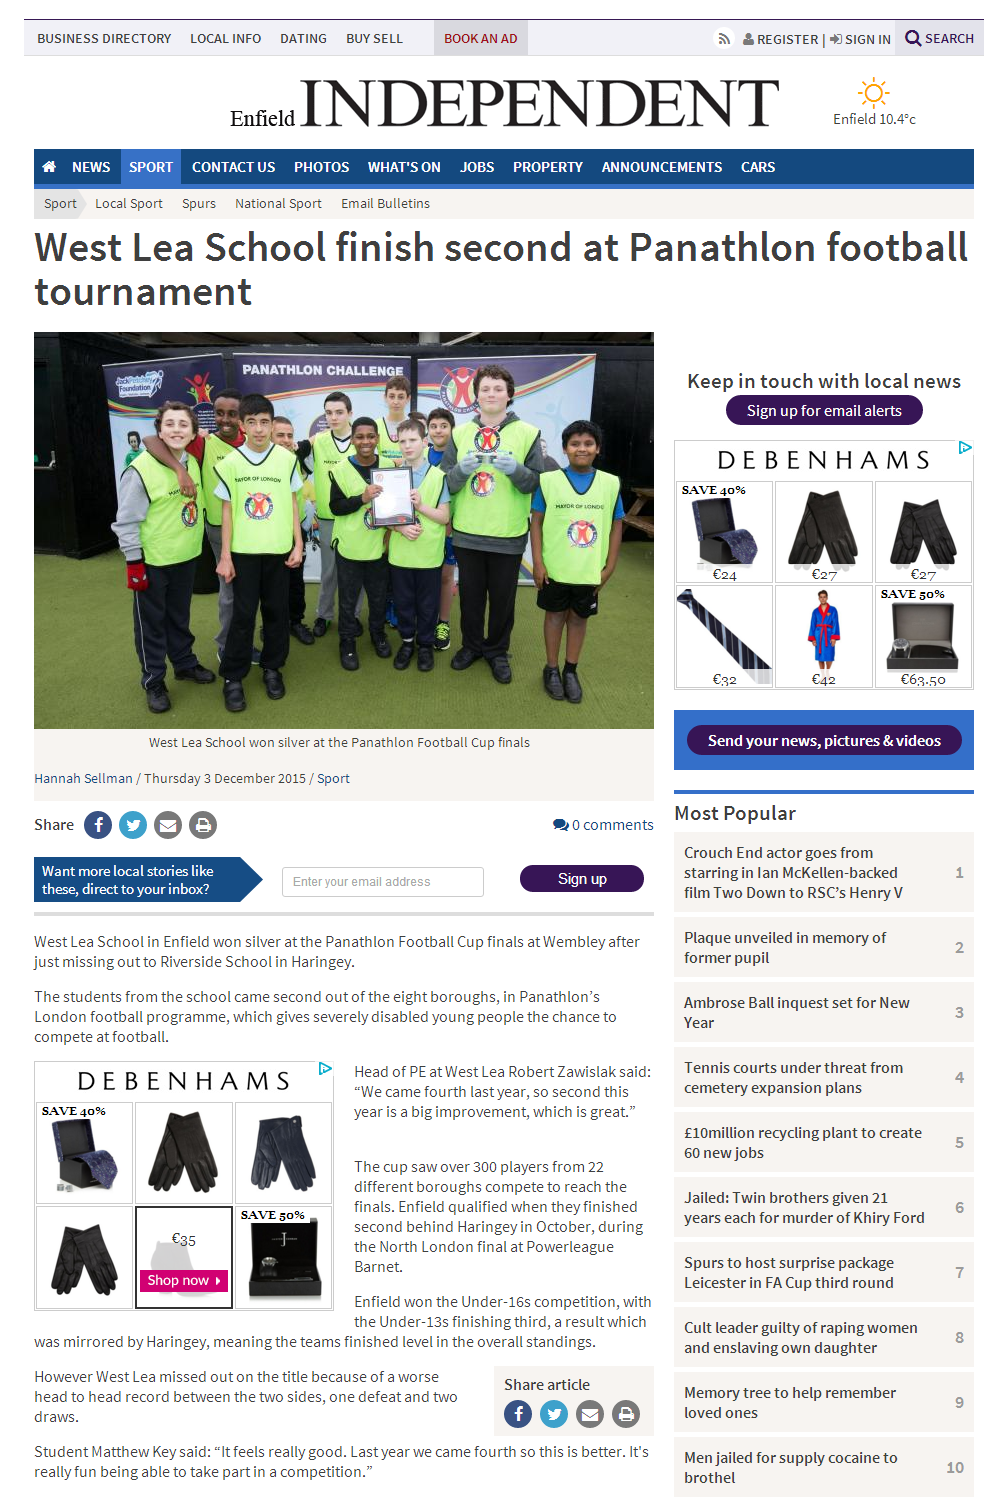 Enfield Independent - 3 December 2015